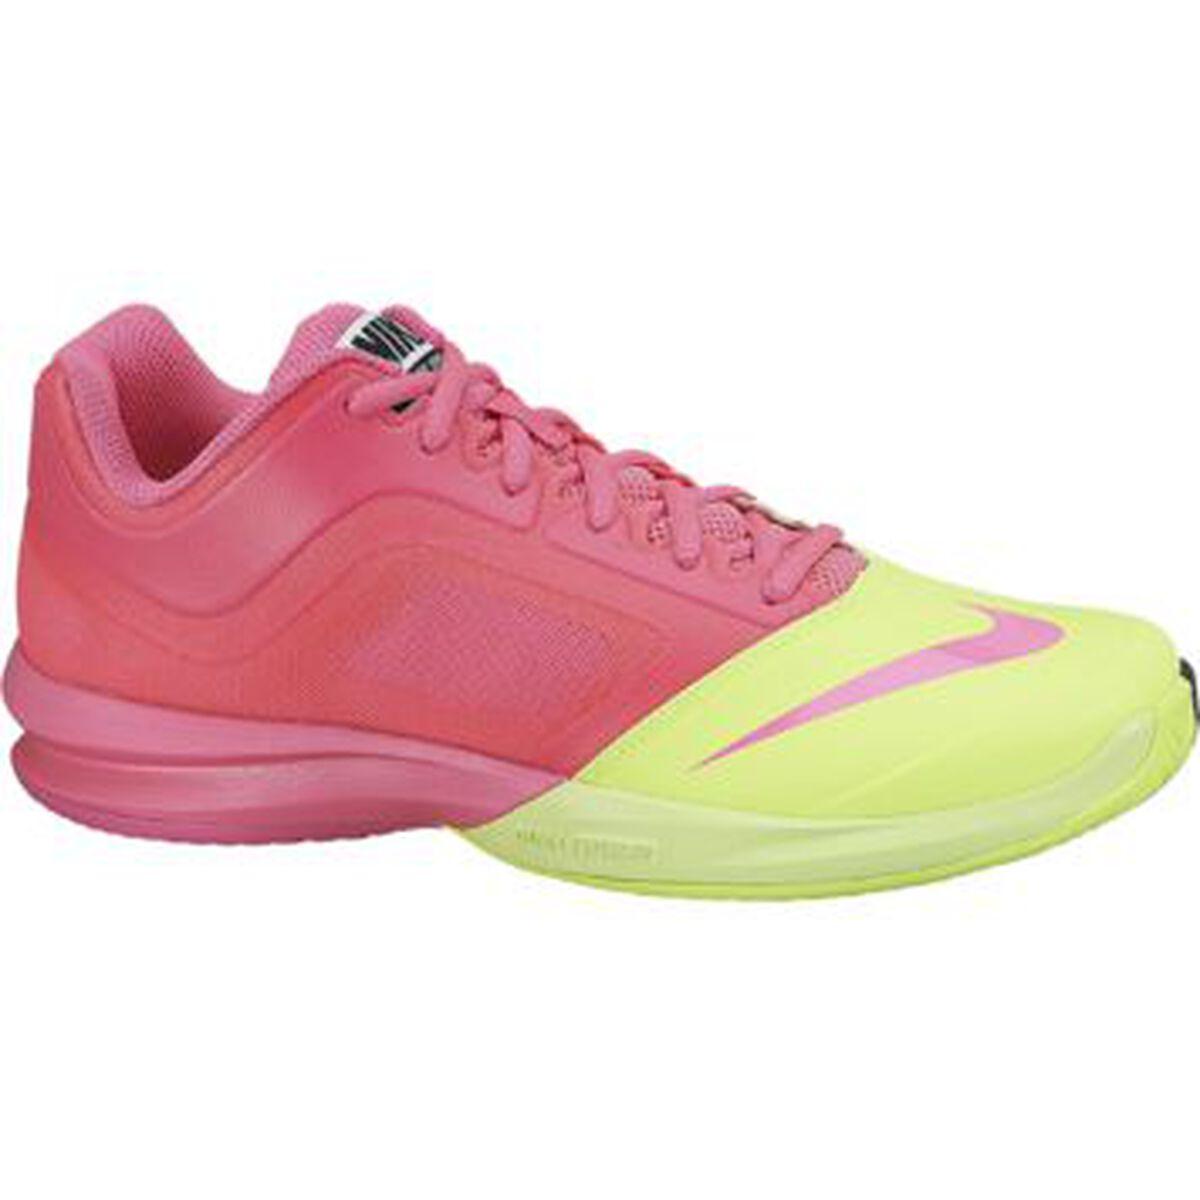 hot sales 8fa60 fe364 Images. Nike Dual Fusion Ballistec Advantage Women  39 s Tennis Shoe ...